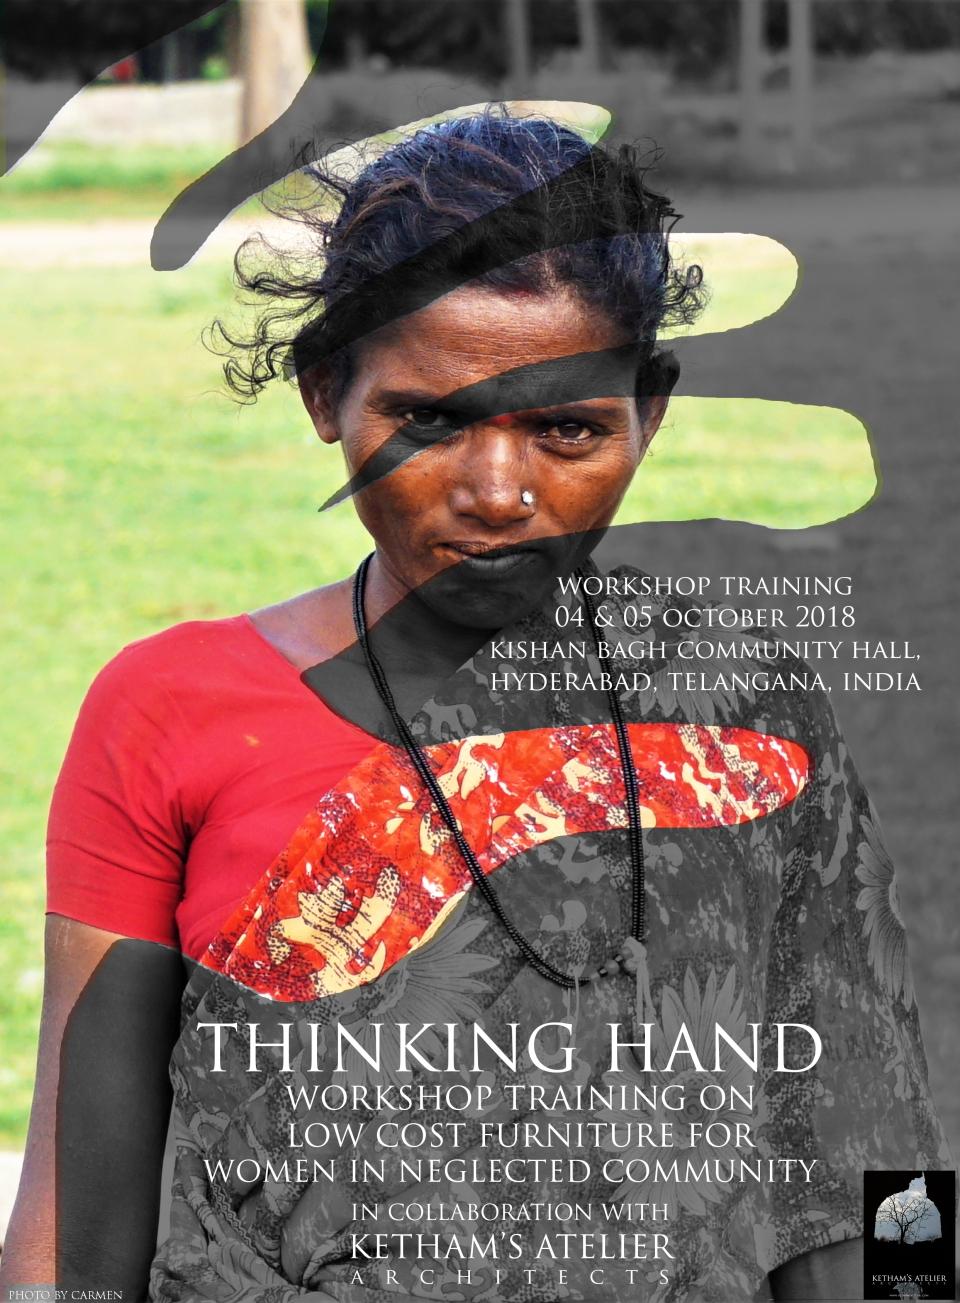 Thinking Hand Workshop for Women in Neglected Community 2018 - Ketham Santosh Kumar